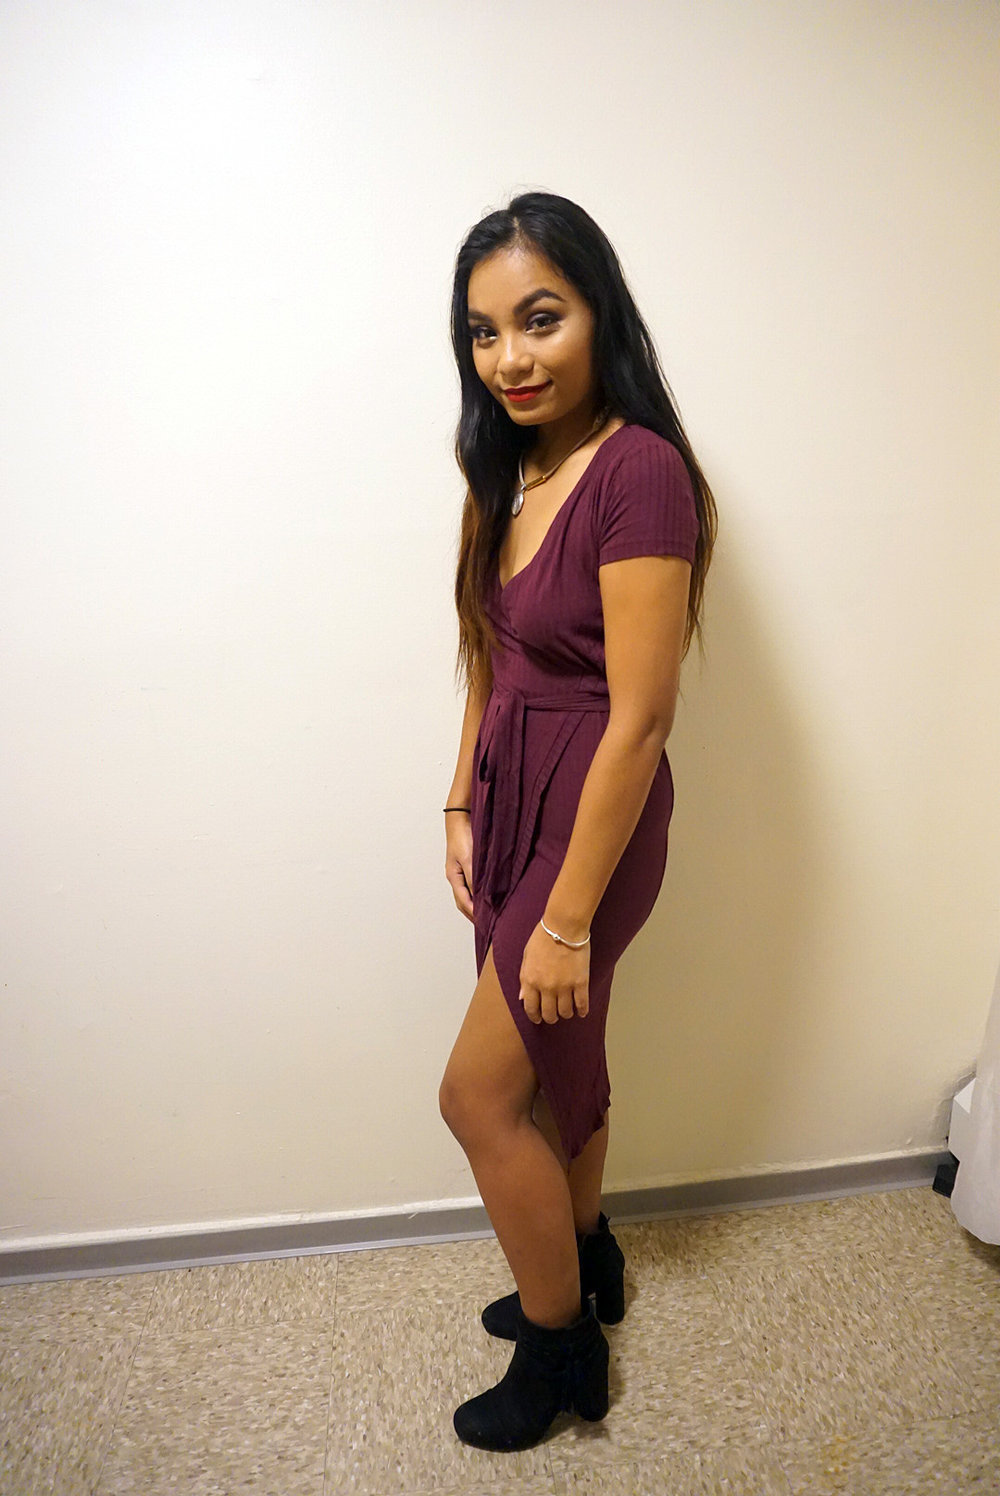 Classy-Low-Cut-Slit-Dress-Blogger-Style-LINDETENCHITRAN-1-1080x1616.jpg